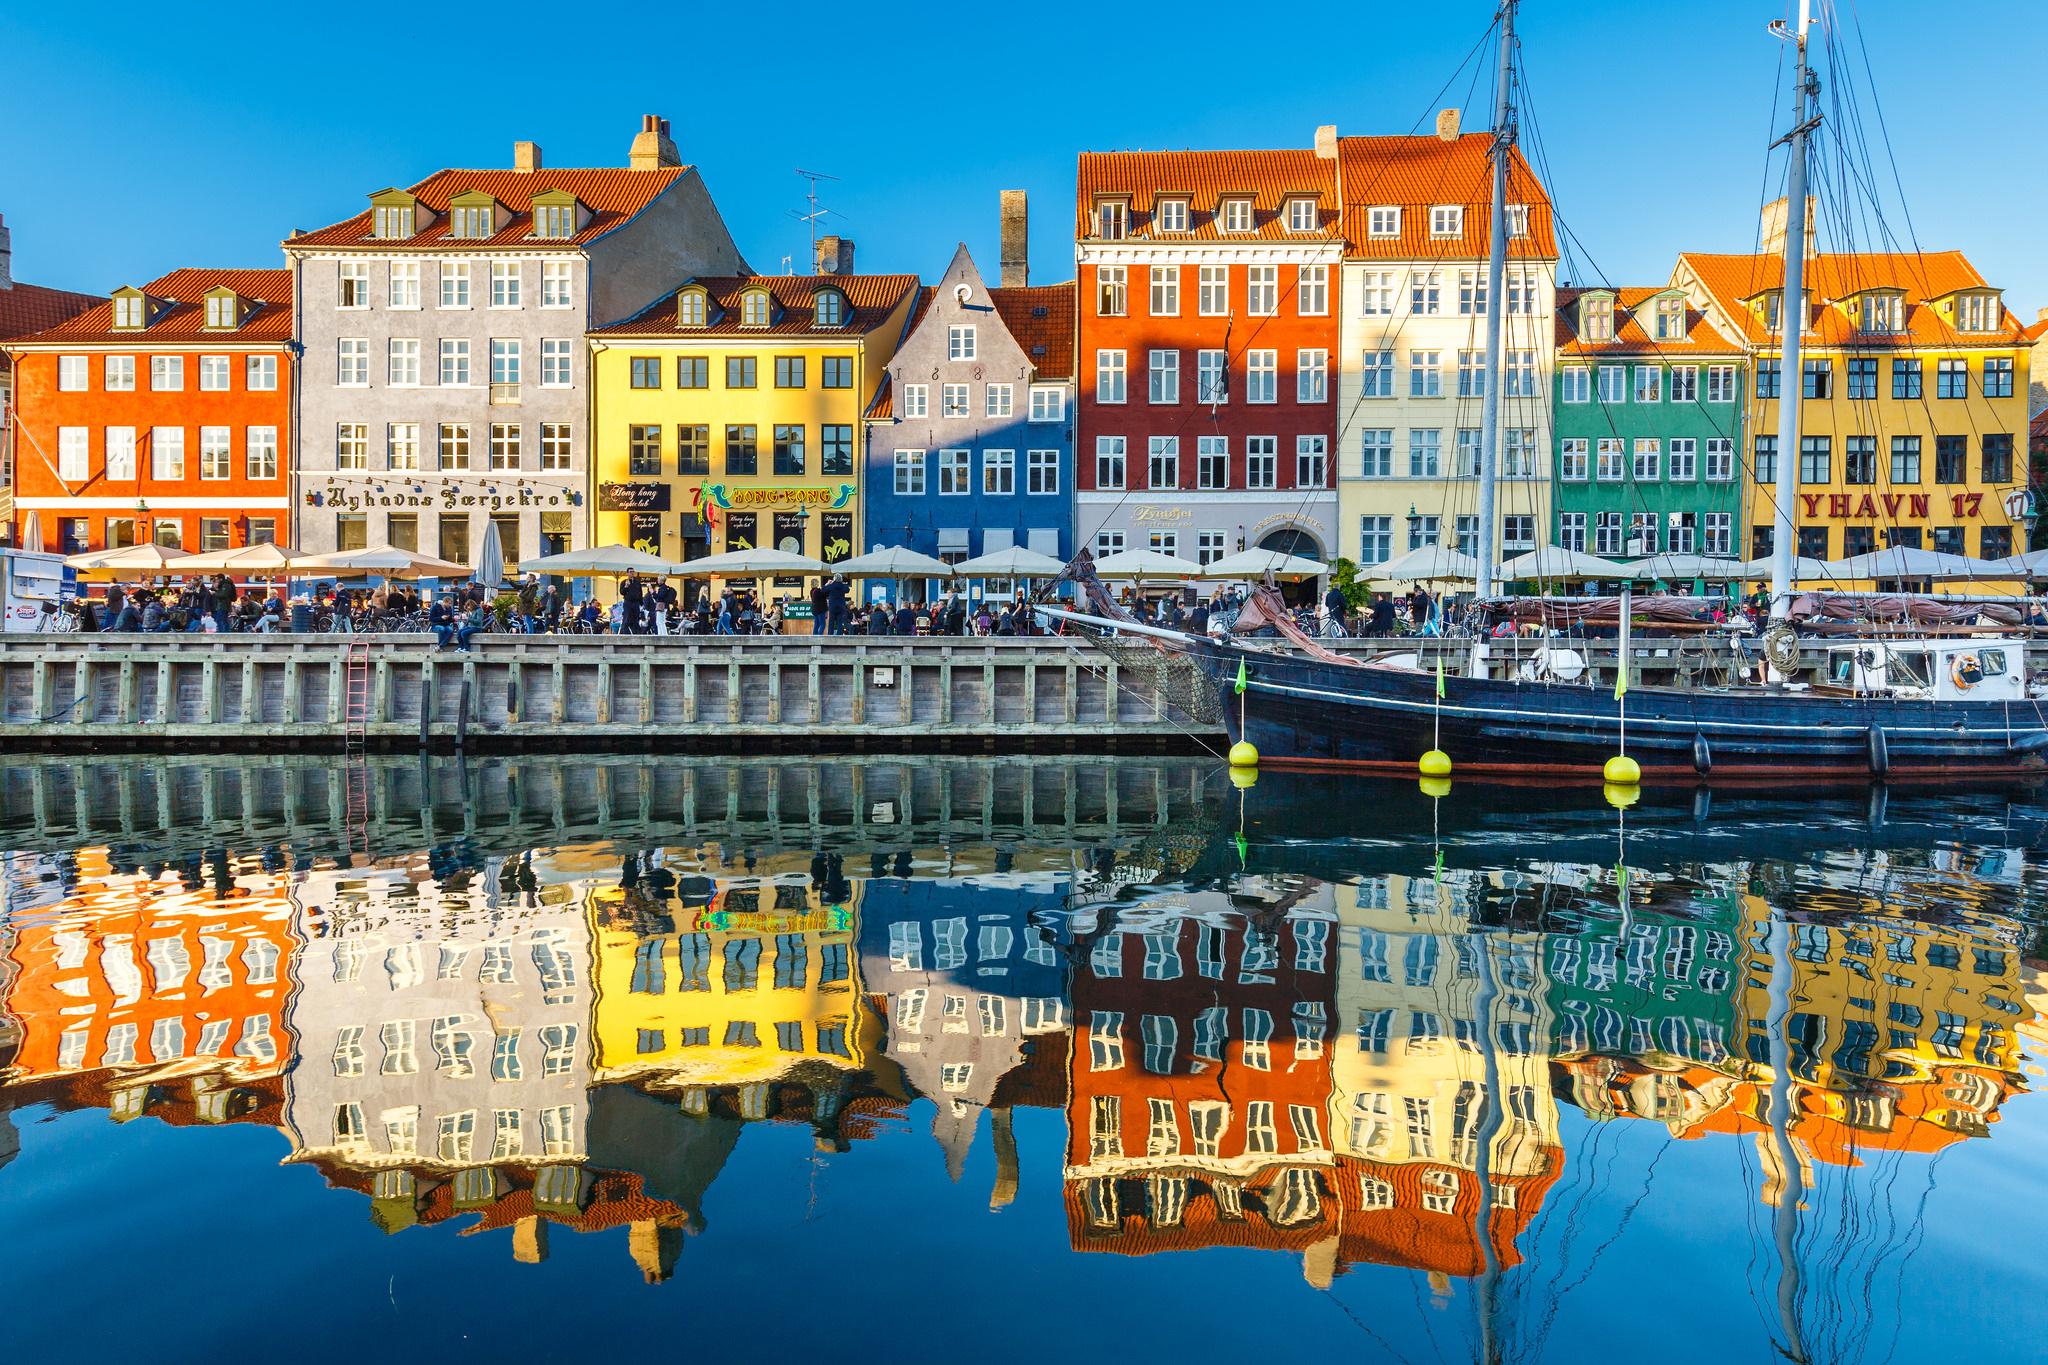 Copenhagen Denmark HD Wallpaper Background Image 2048x1365 2048x1365